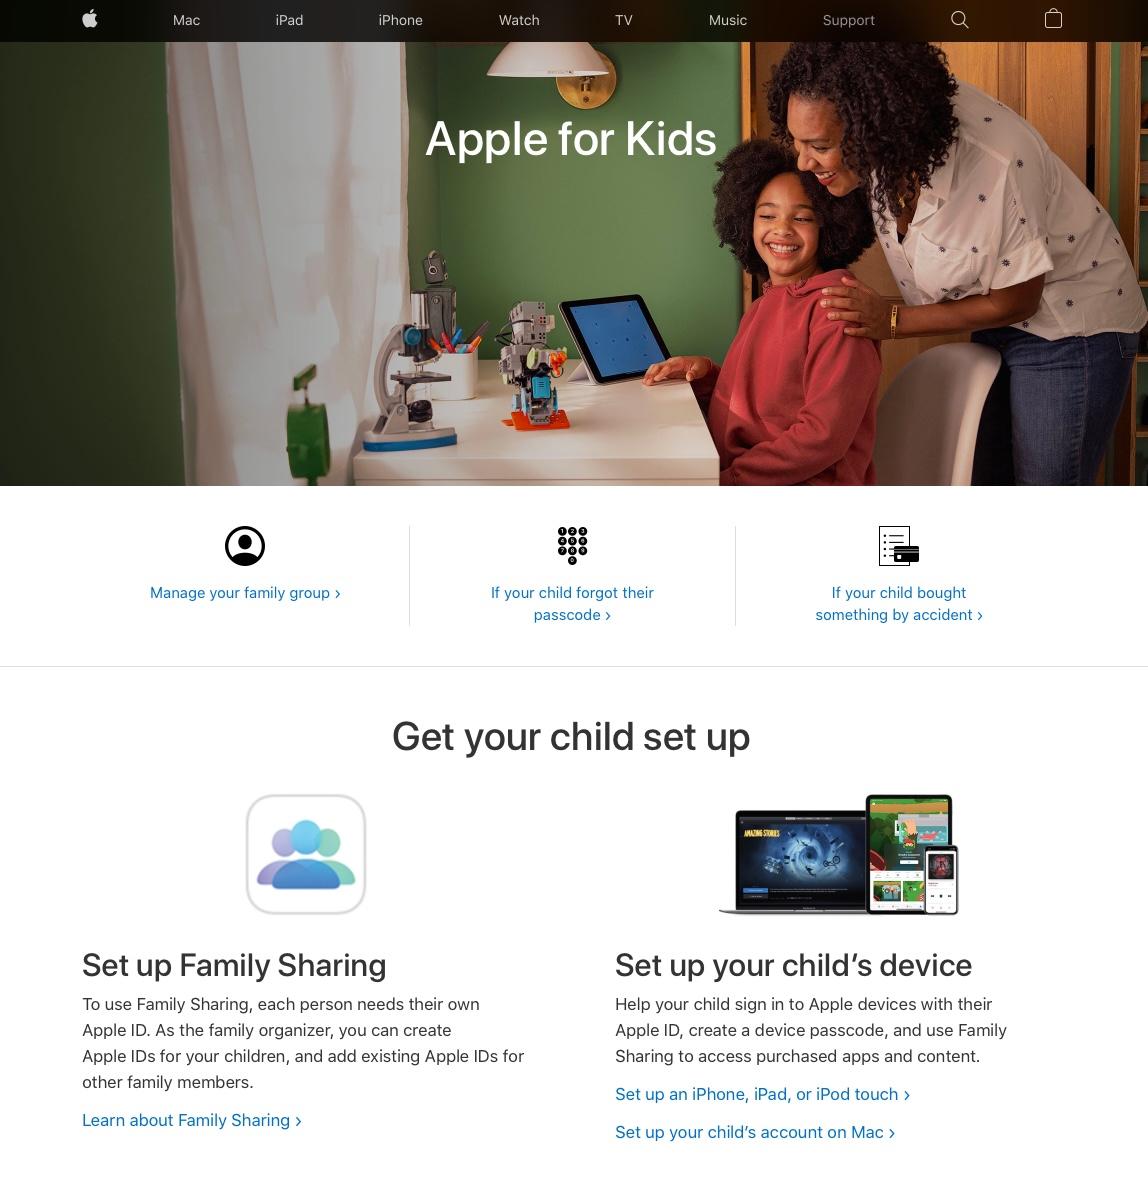 apple for kids support portal